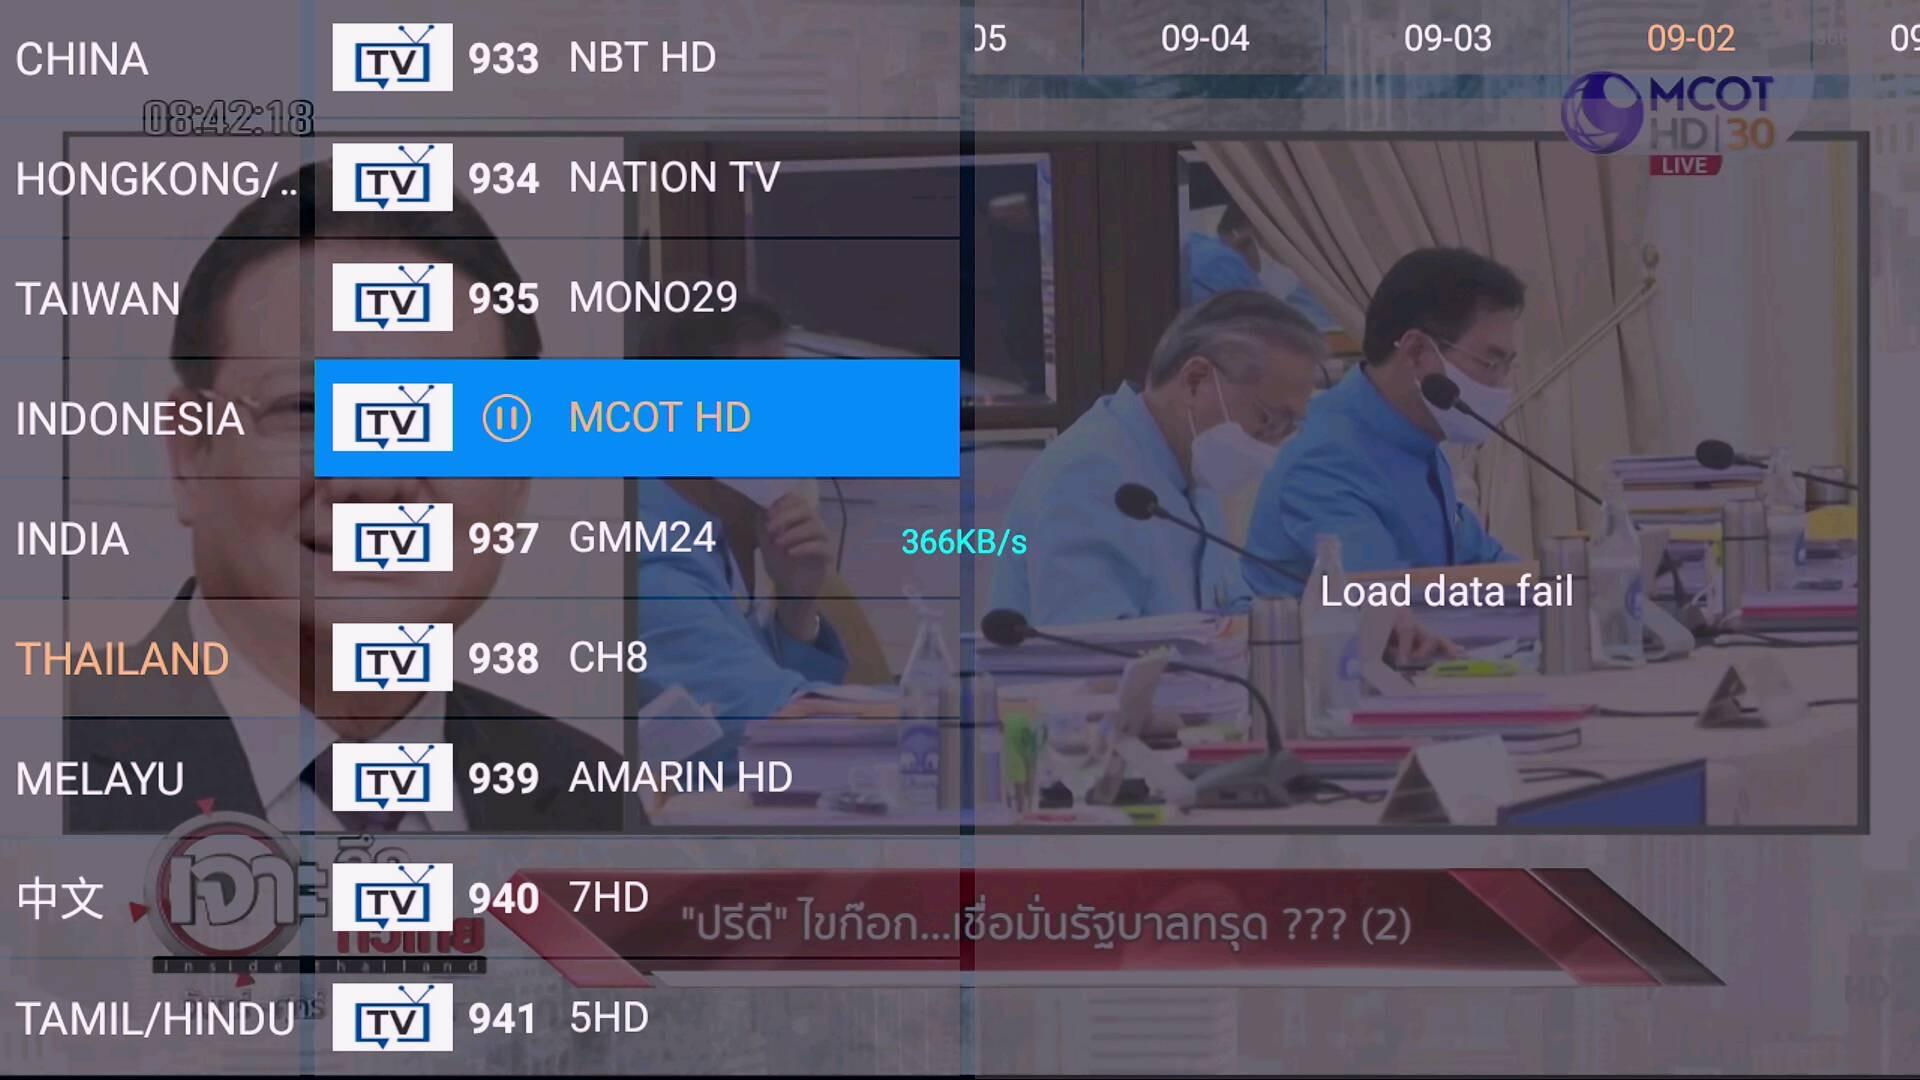 2020 latest Singapore Malaysia tv box iFibre Cloud all Starhub tv channels astro 15